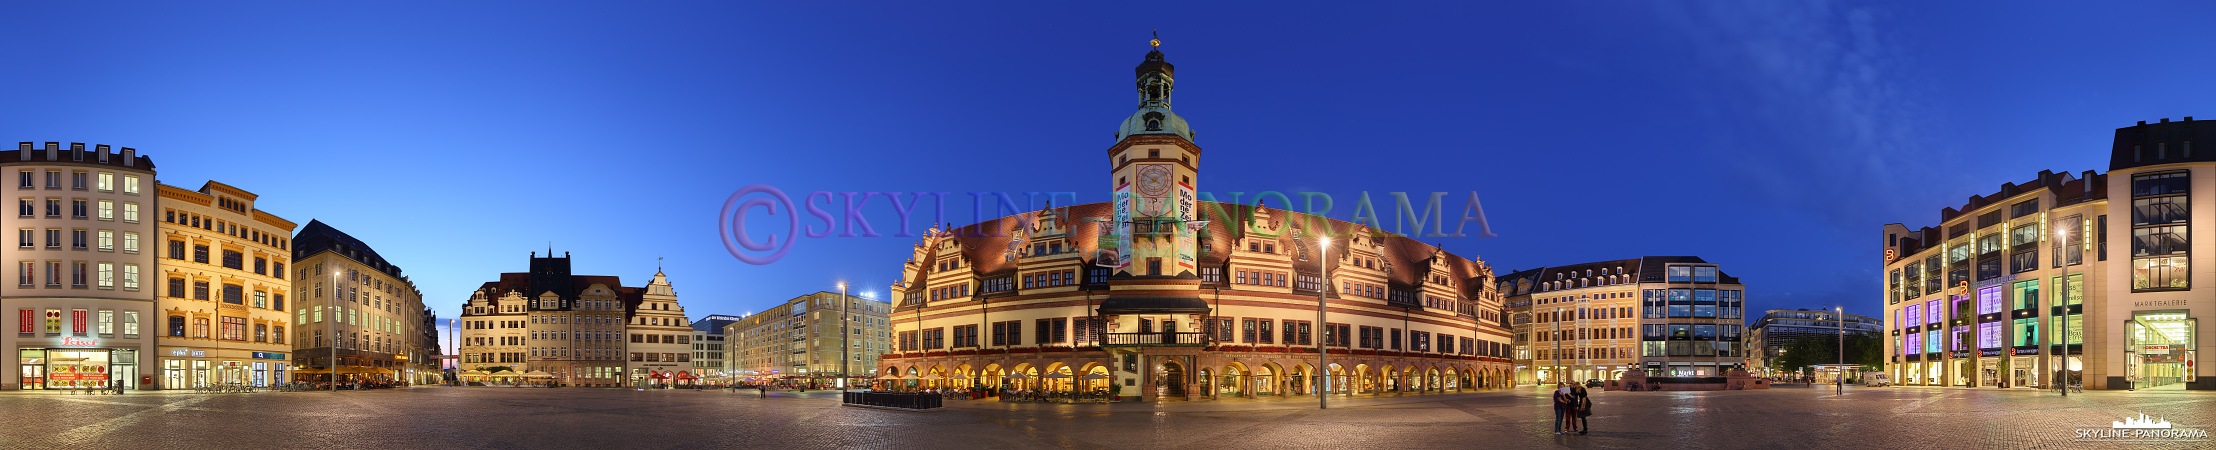 Bild Leipzig Marktplatz